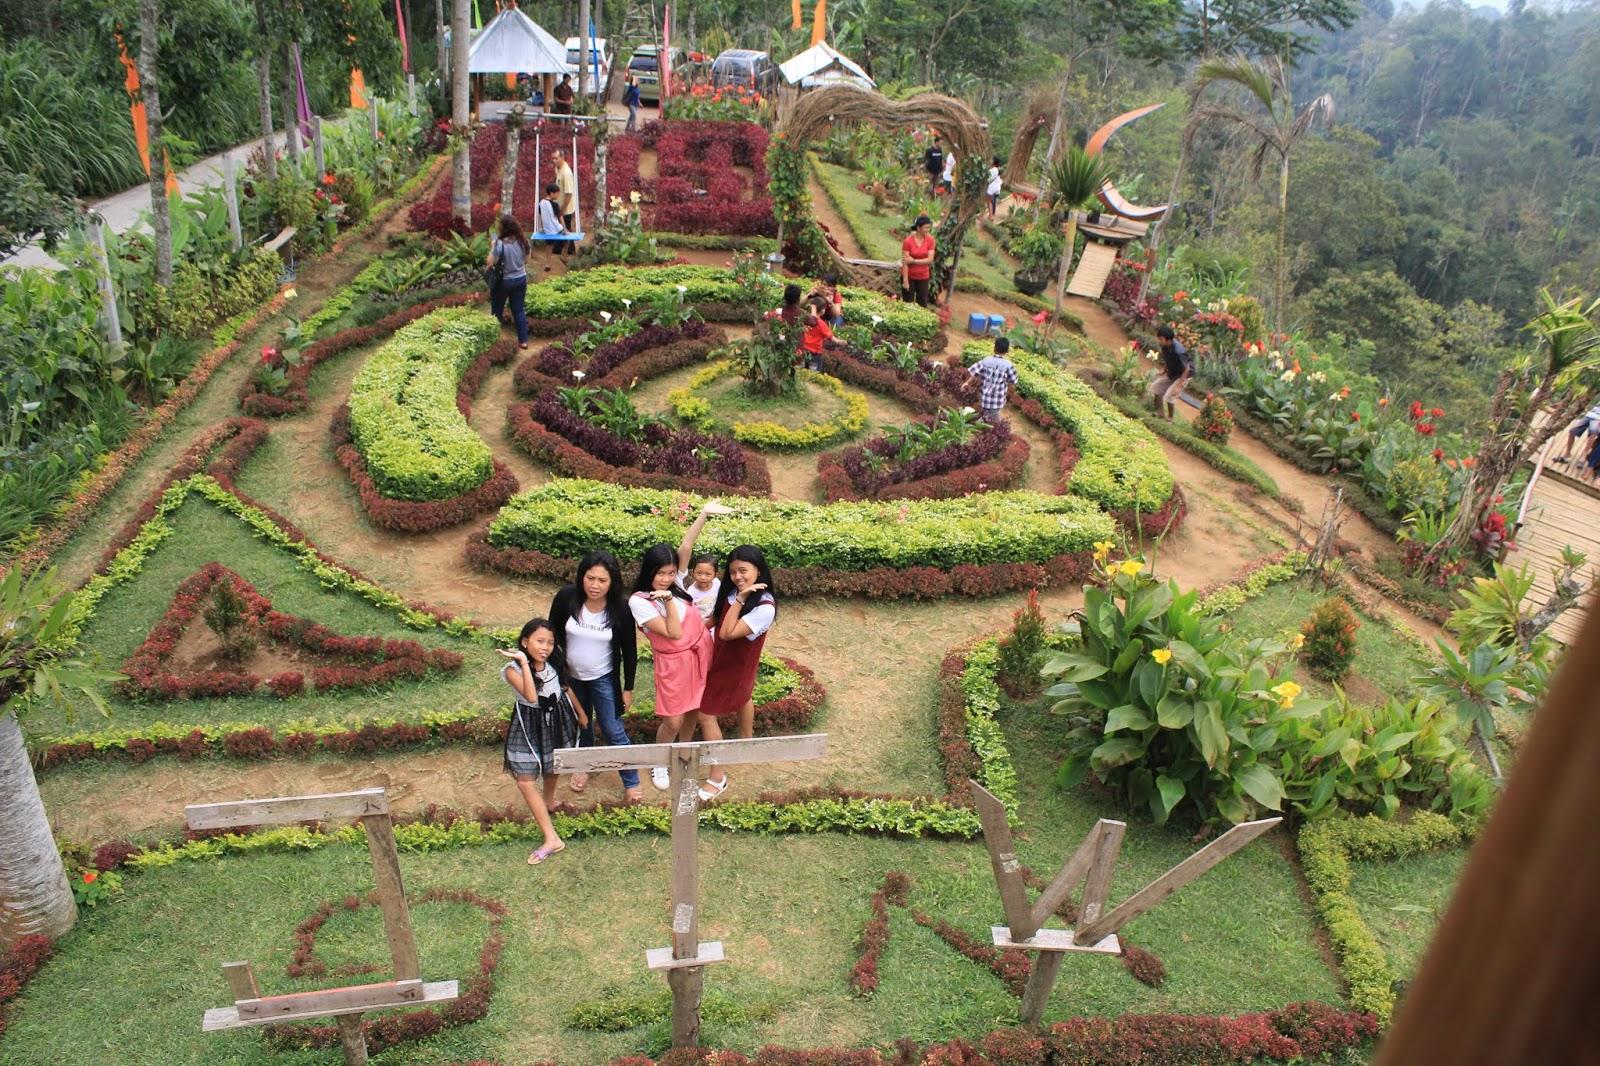 Wanagiri Tower Garden Sukasada, Destinasi Wisata Instagramable yang Ngehits di Bali